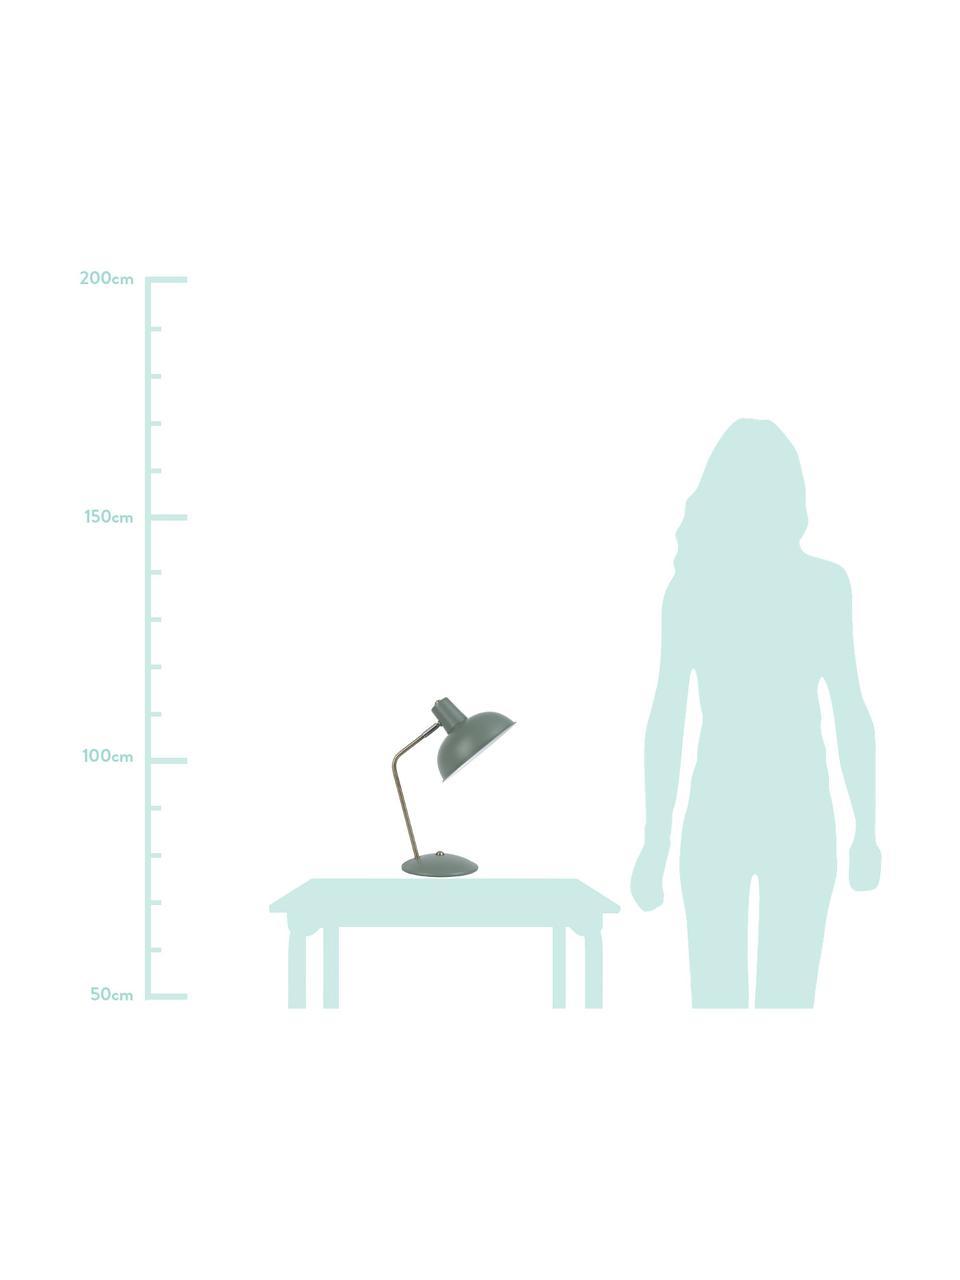 Retro-Schreibtischlampe Hood, Lampenschirm: Metall, lackiert, Lampenfuß: Metall, lackiert, Leuchte: Grün, Messingfarben Lampenschirm innen: Weiß, 20 x 38 cm